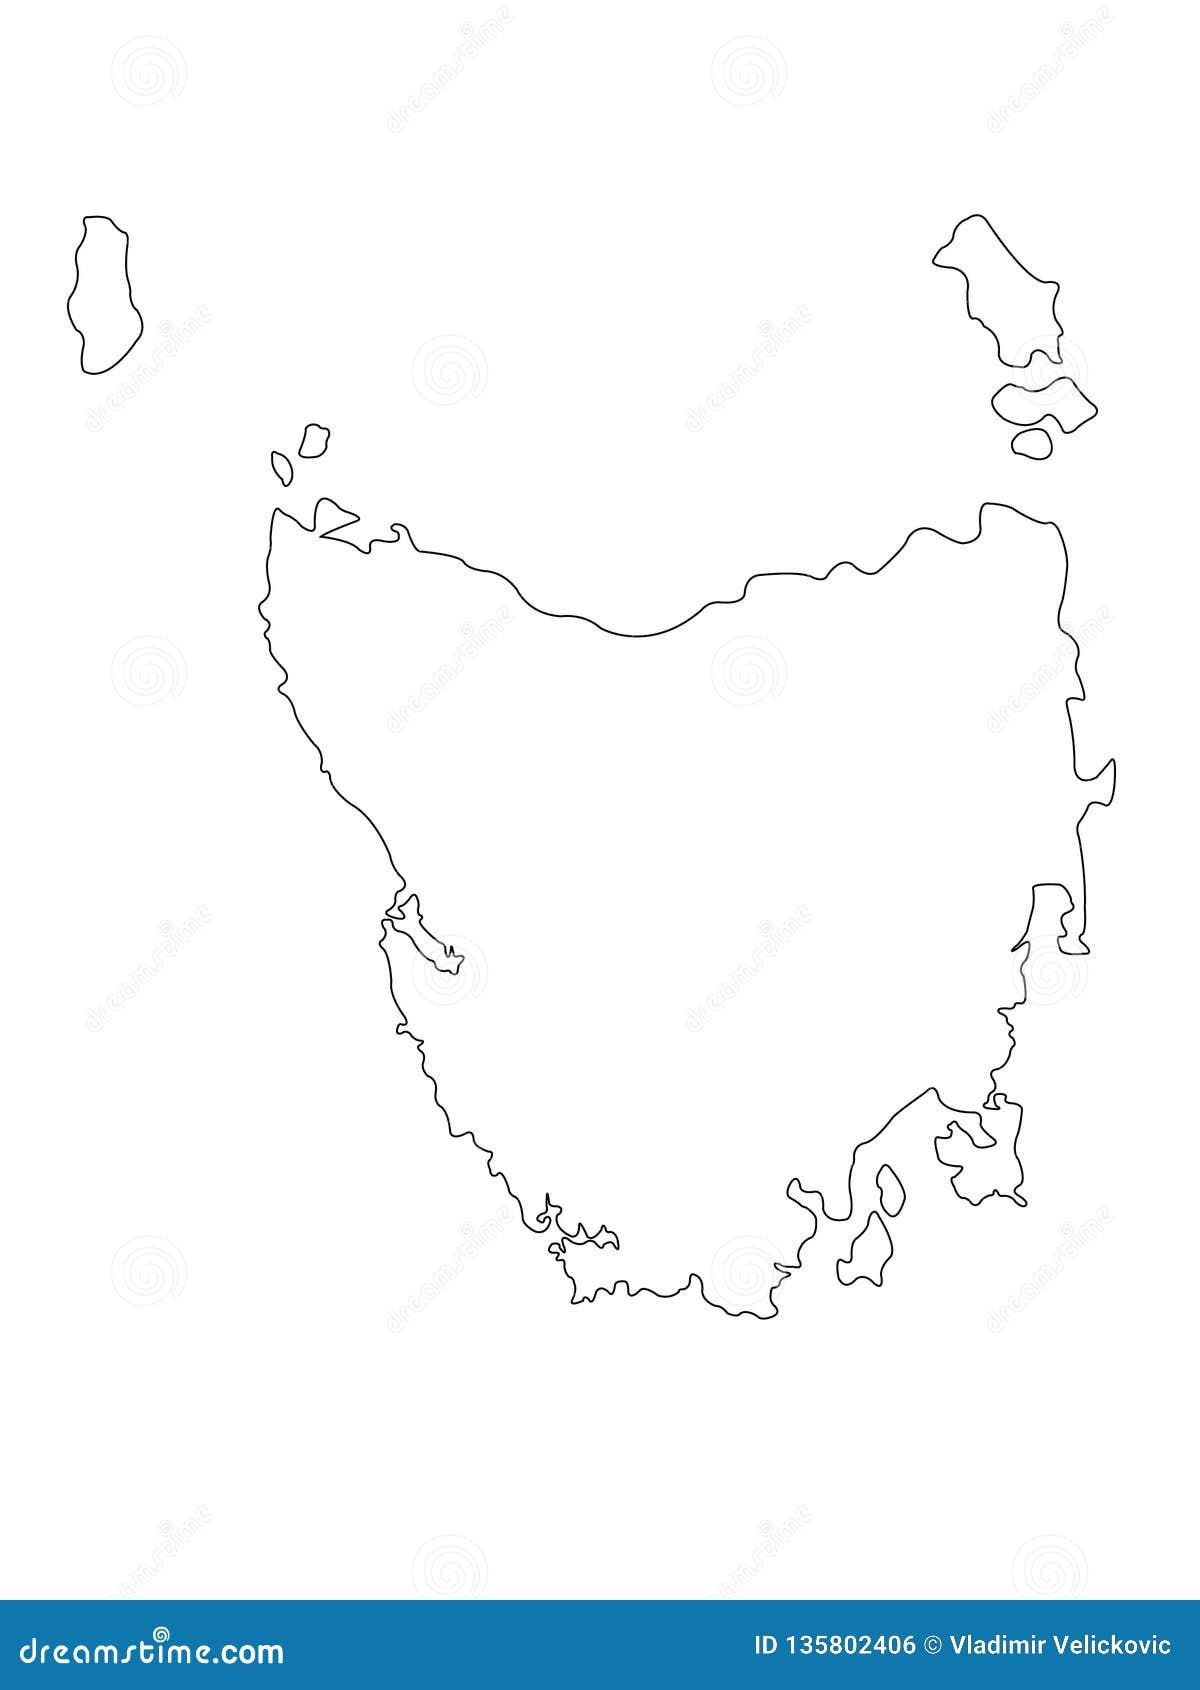 Map Of Australia And Tasmania.Tasmania Map Is An Island State Of Australia Stock Vector